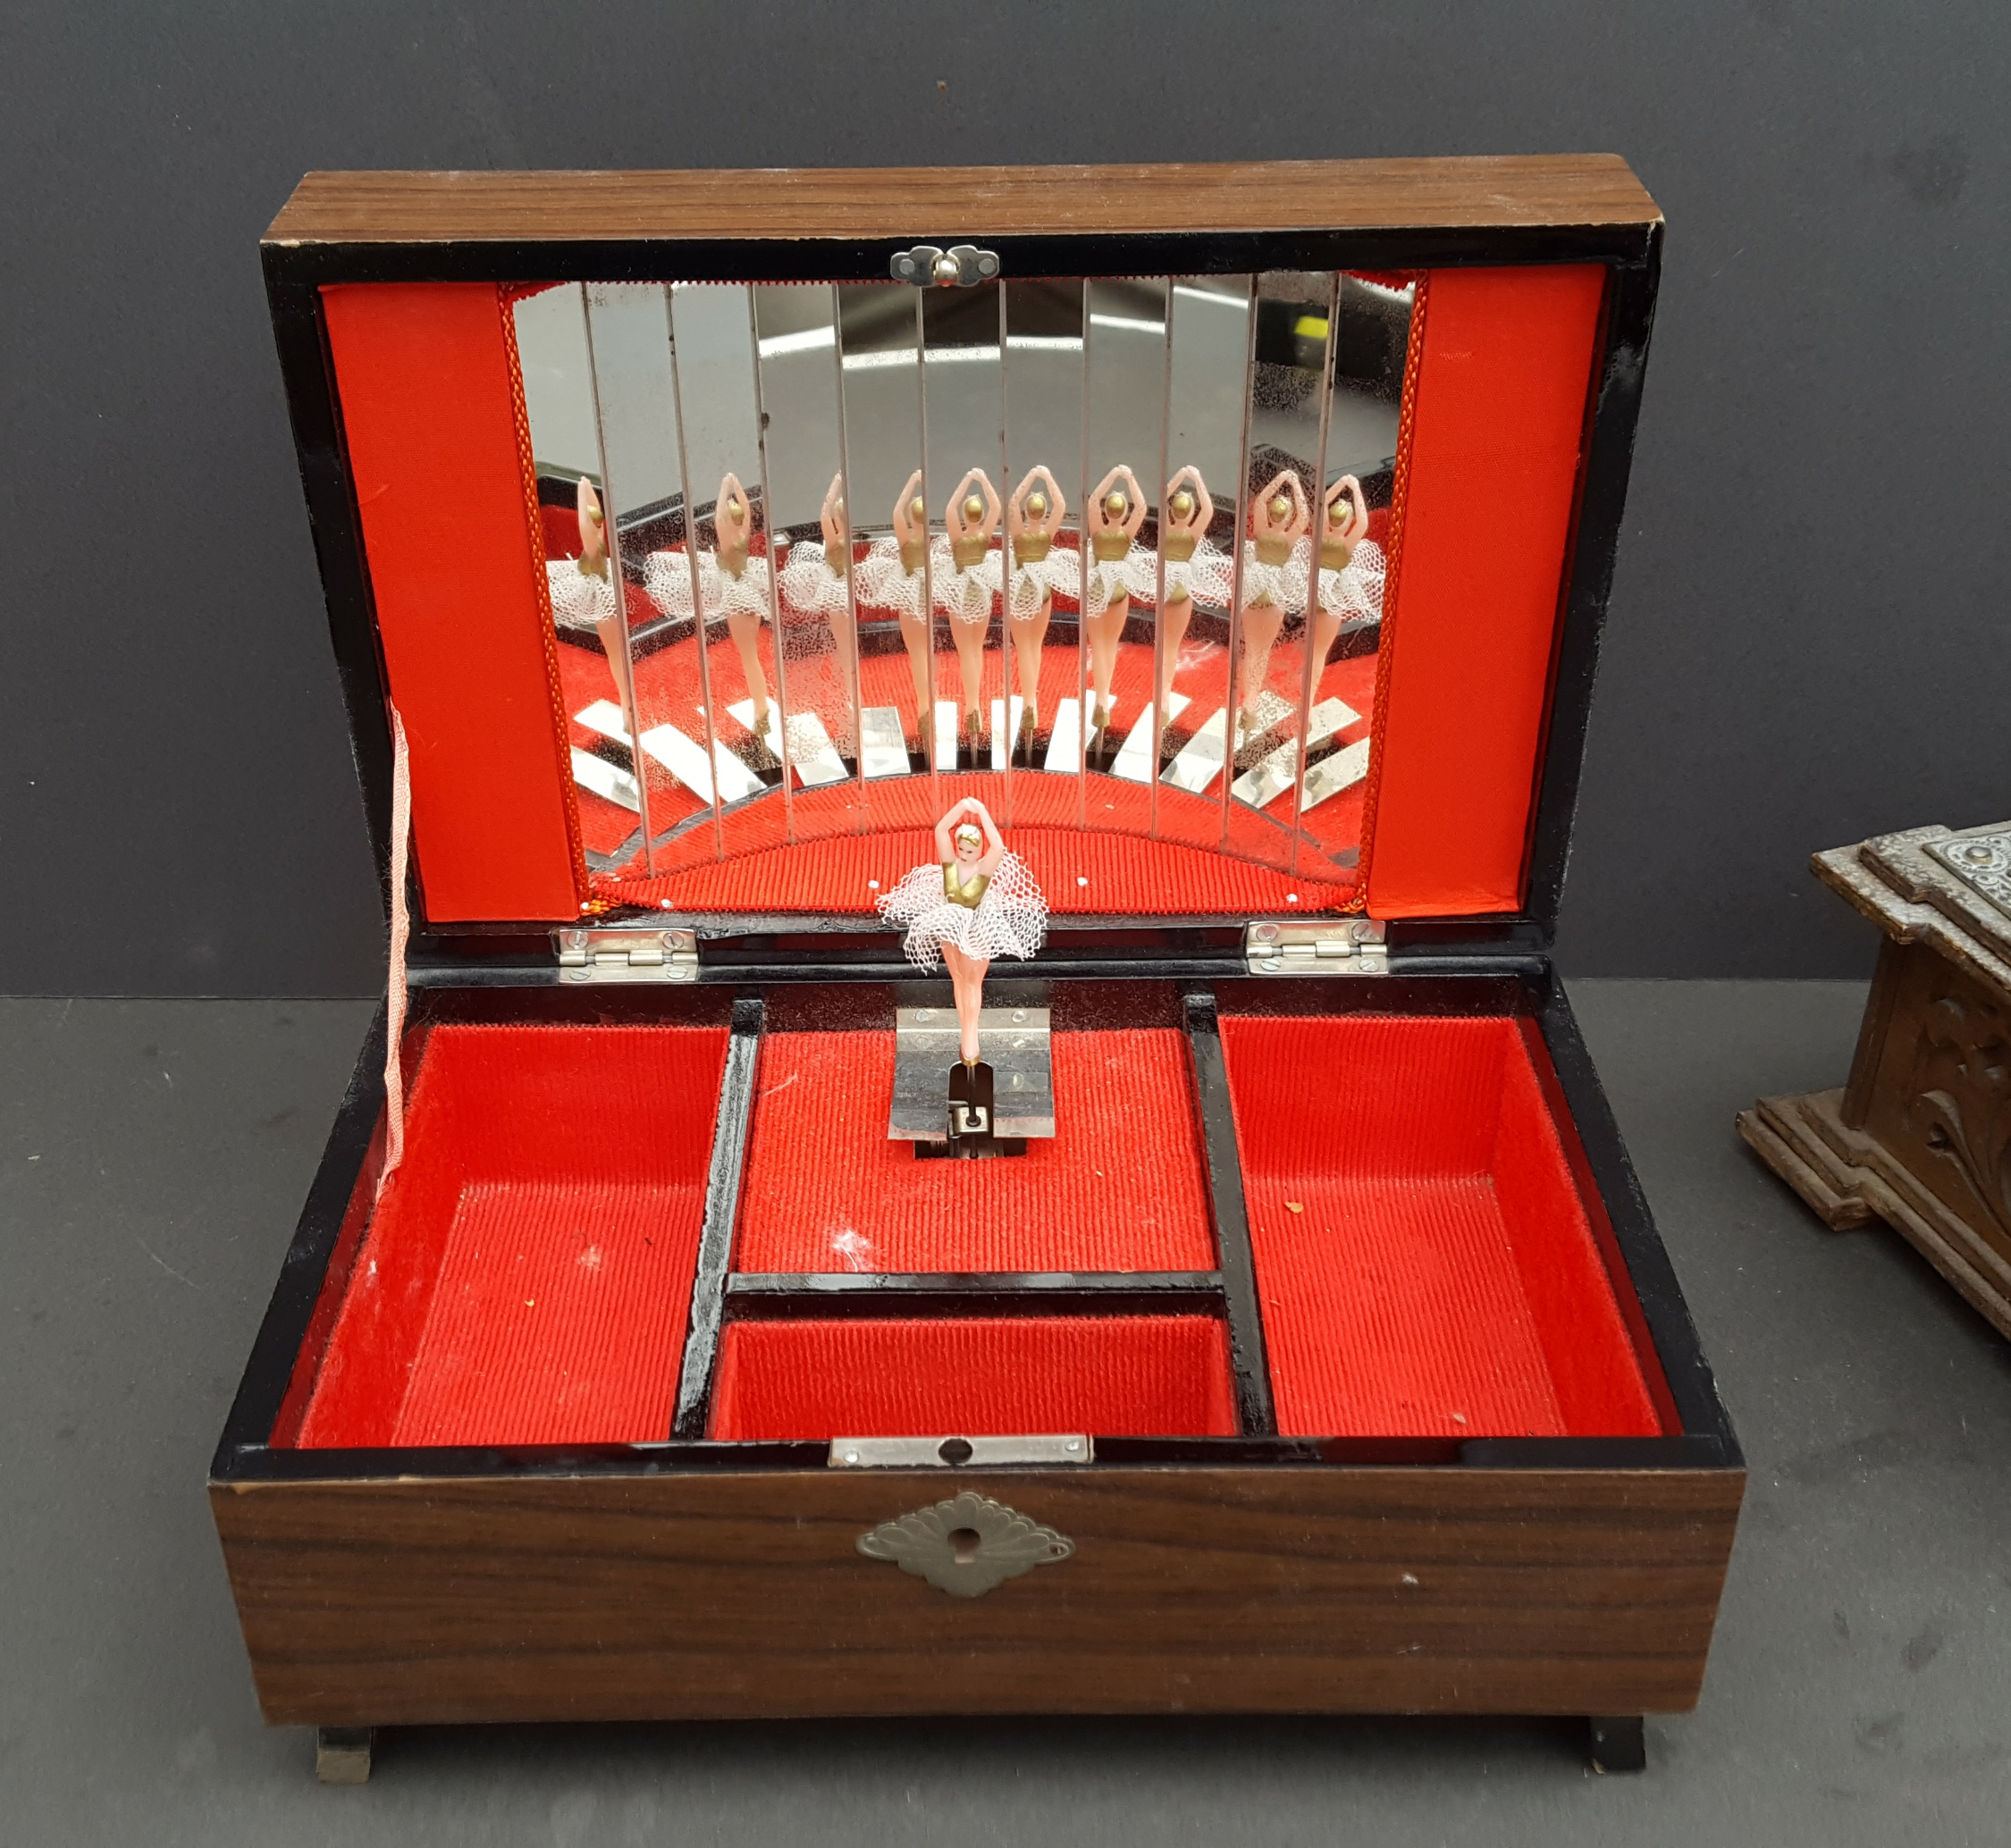 Vintage Retro 2 x Jewellery Box 1 Musical NO RESERVE - Image 2 of 3